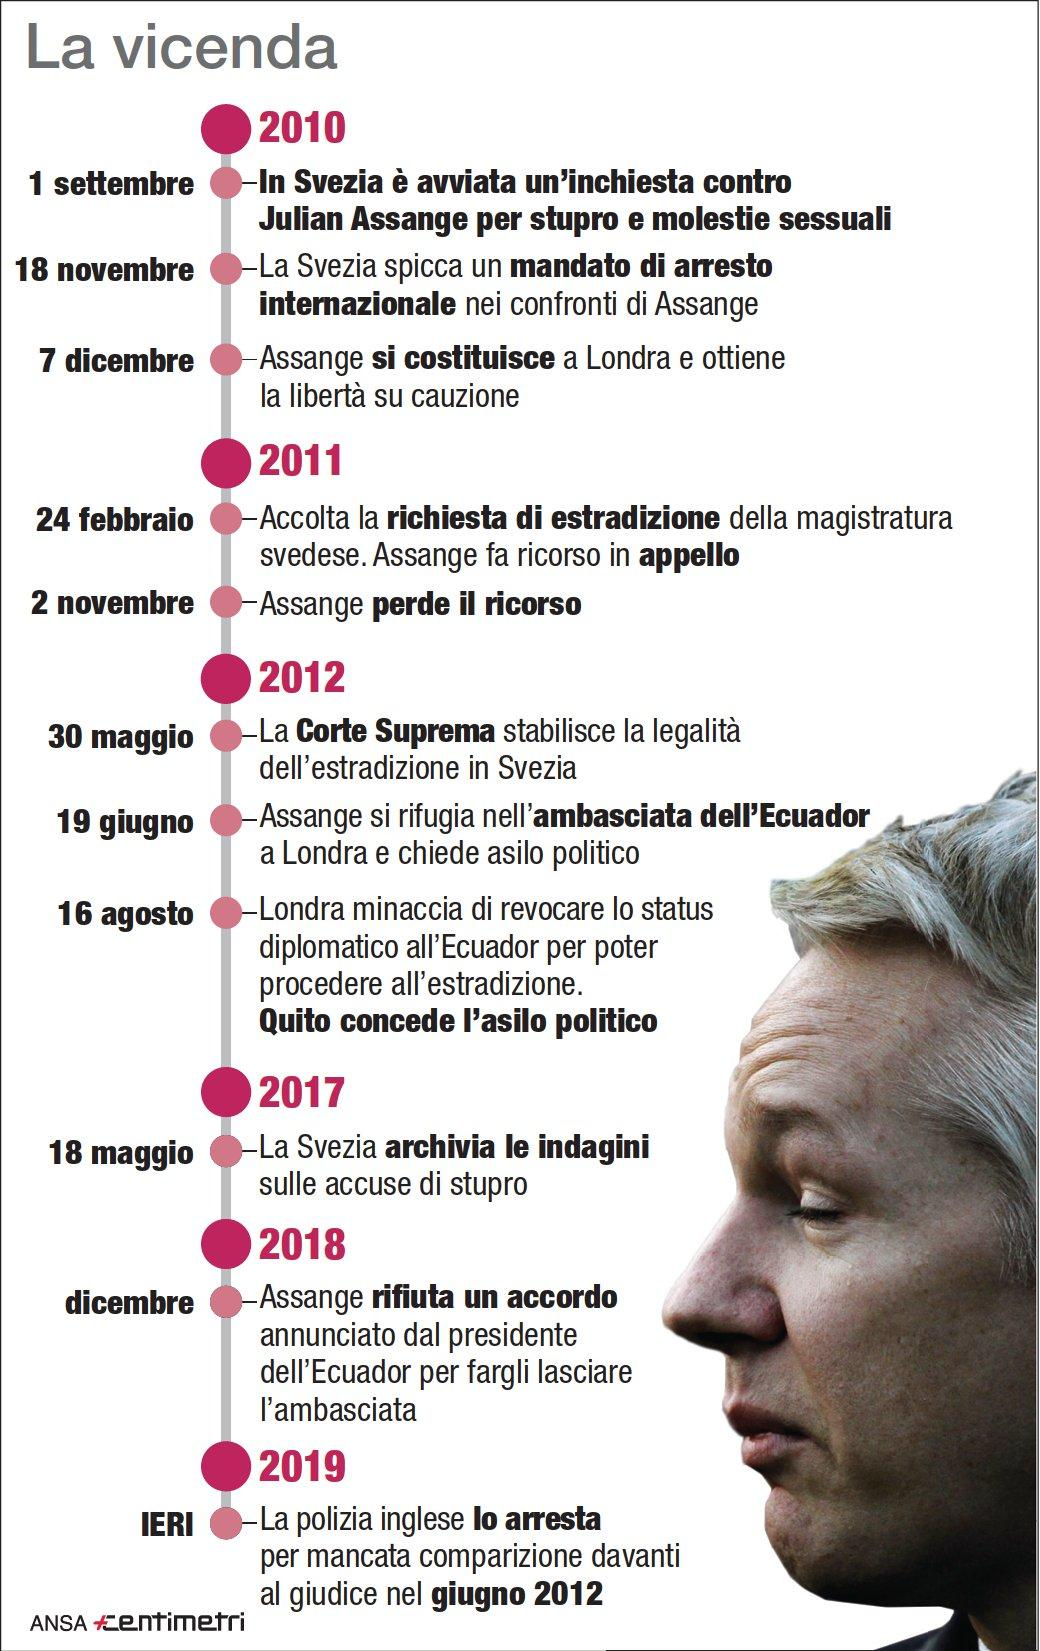 Wikileaks, dal 2010 alla cattura: la vicenda di Julian Assange